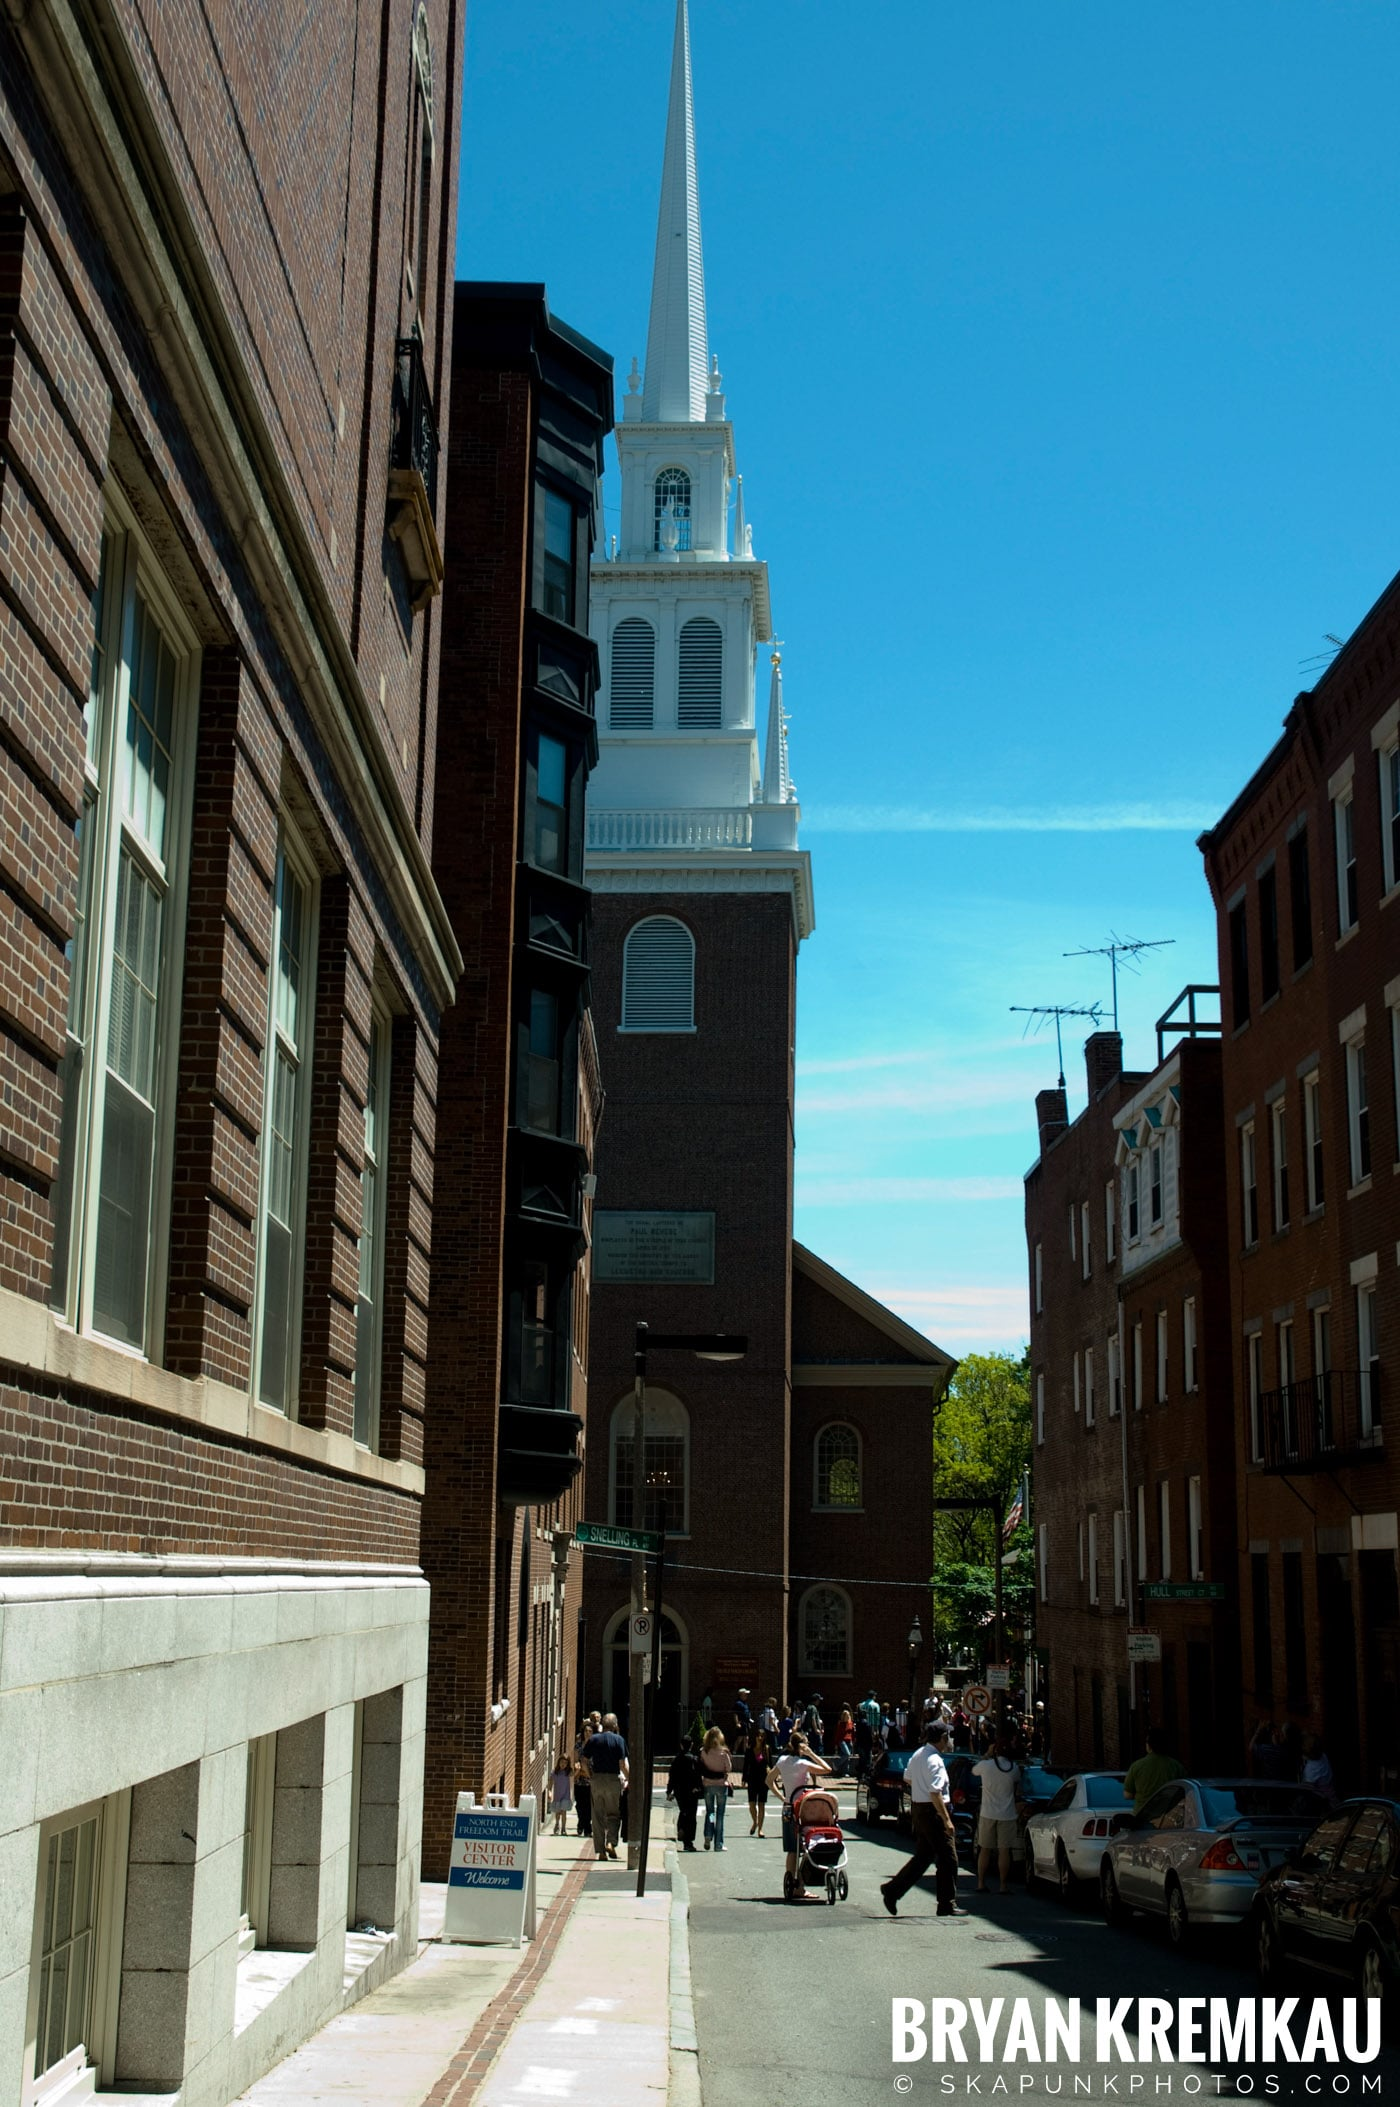 Memorial Day Weekend Trip to Boston - 5.25.08 (17)